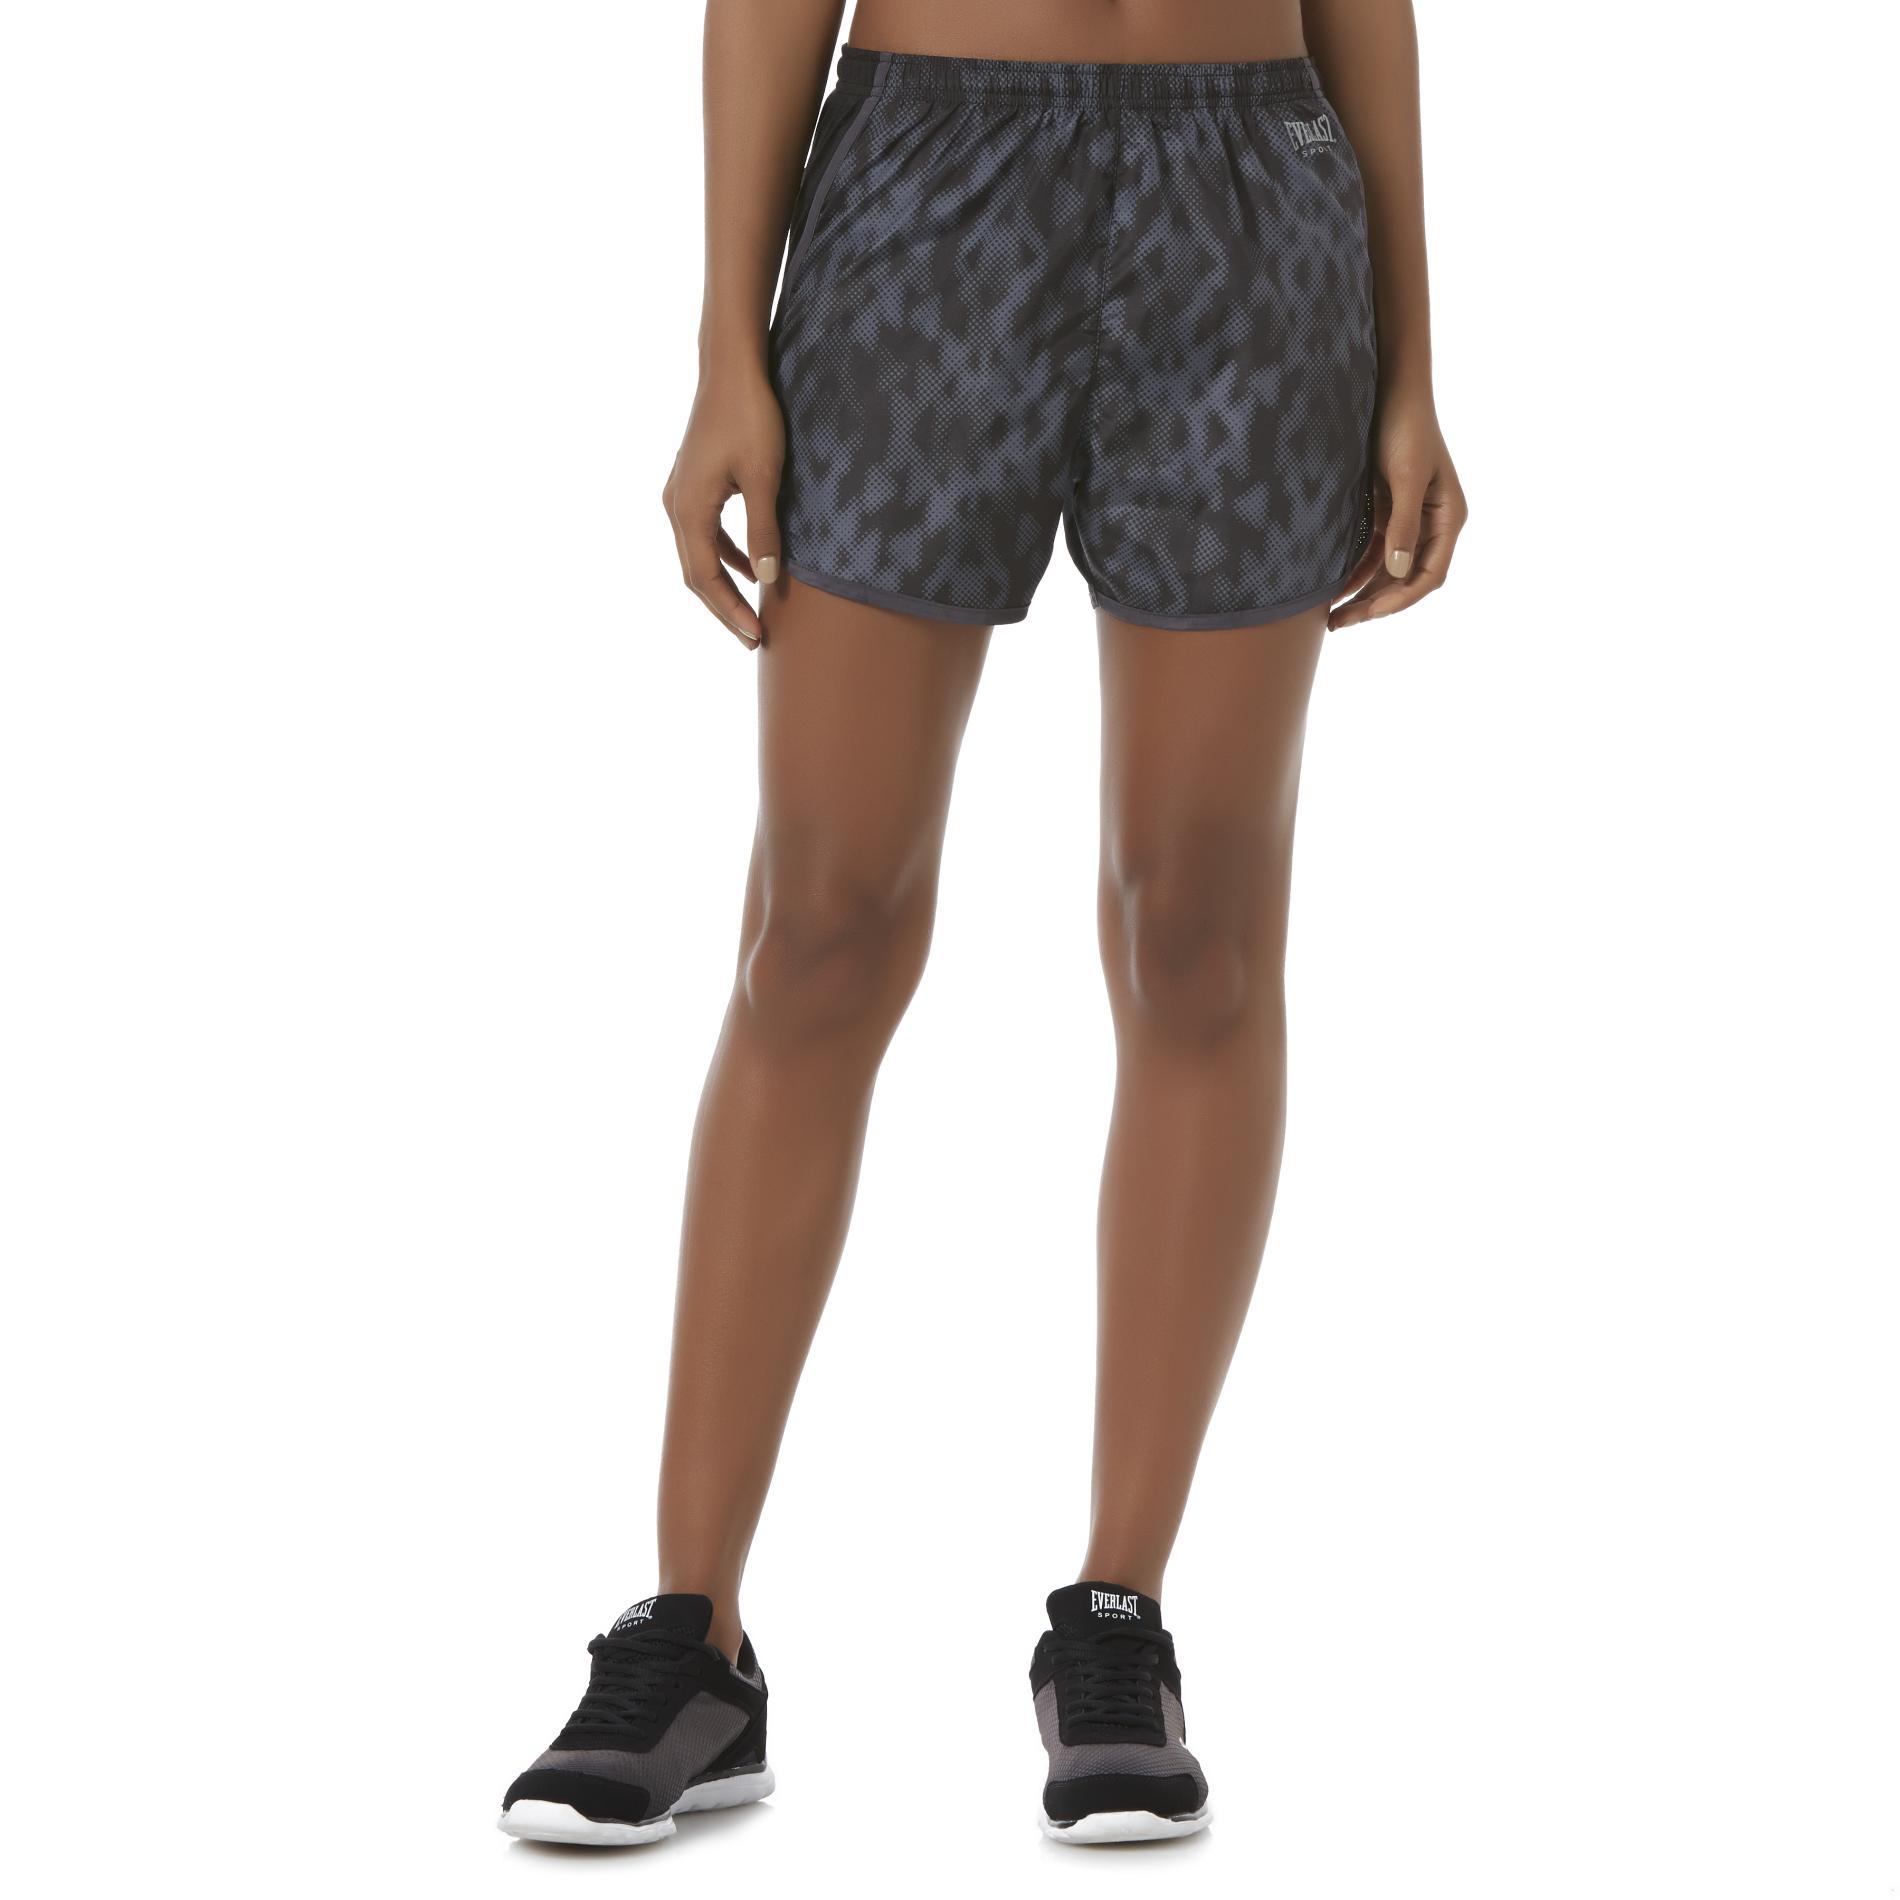 Everlast�� Sport Women's Running Shorts - Abstract Print